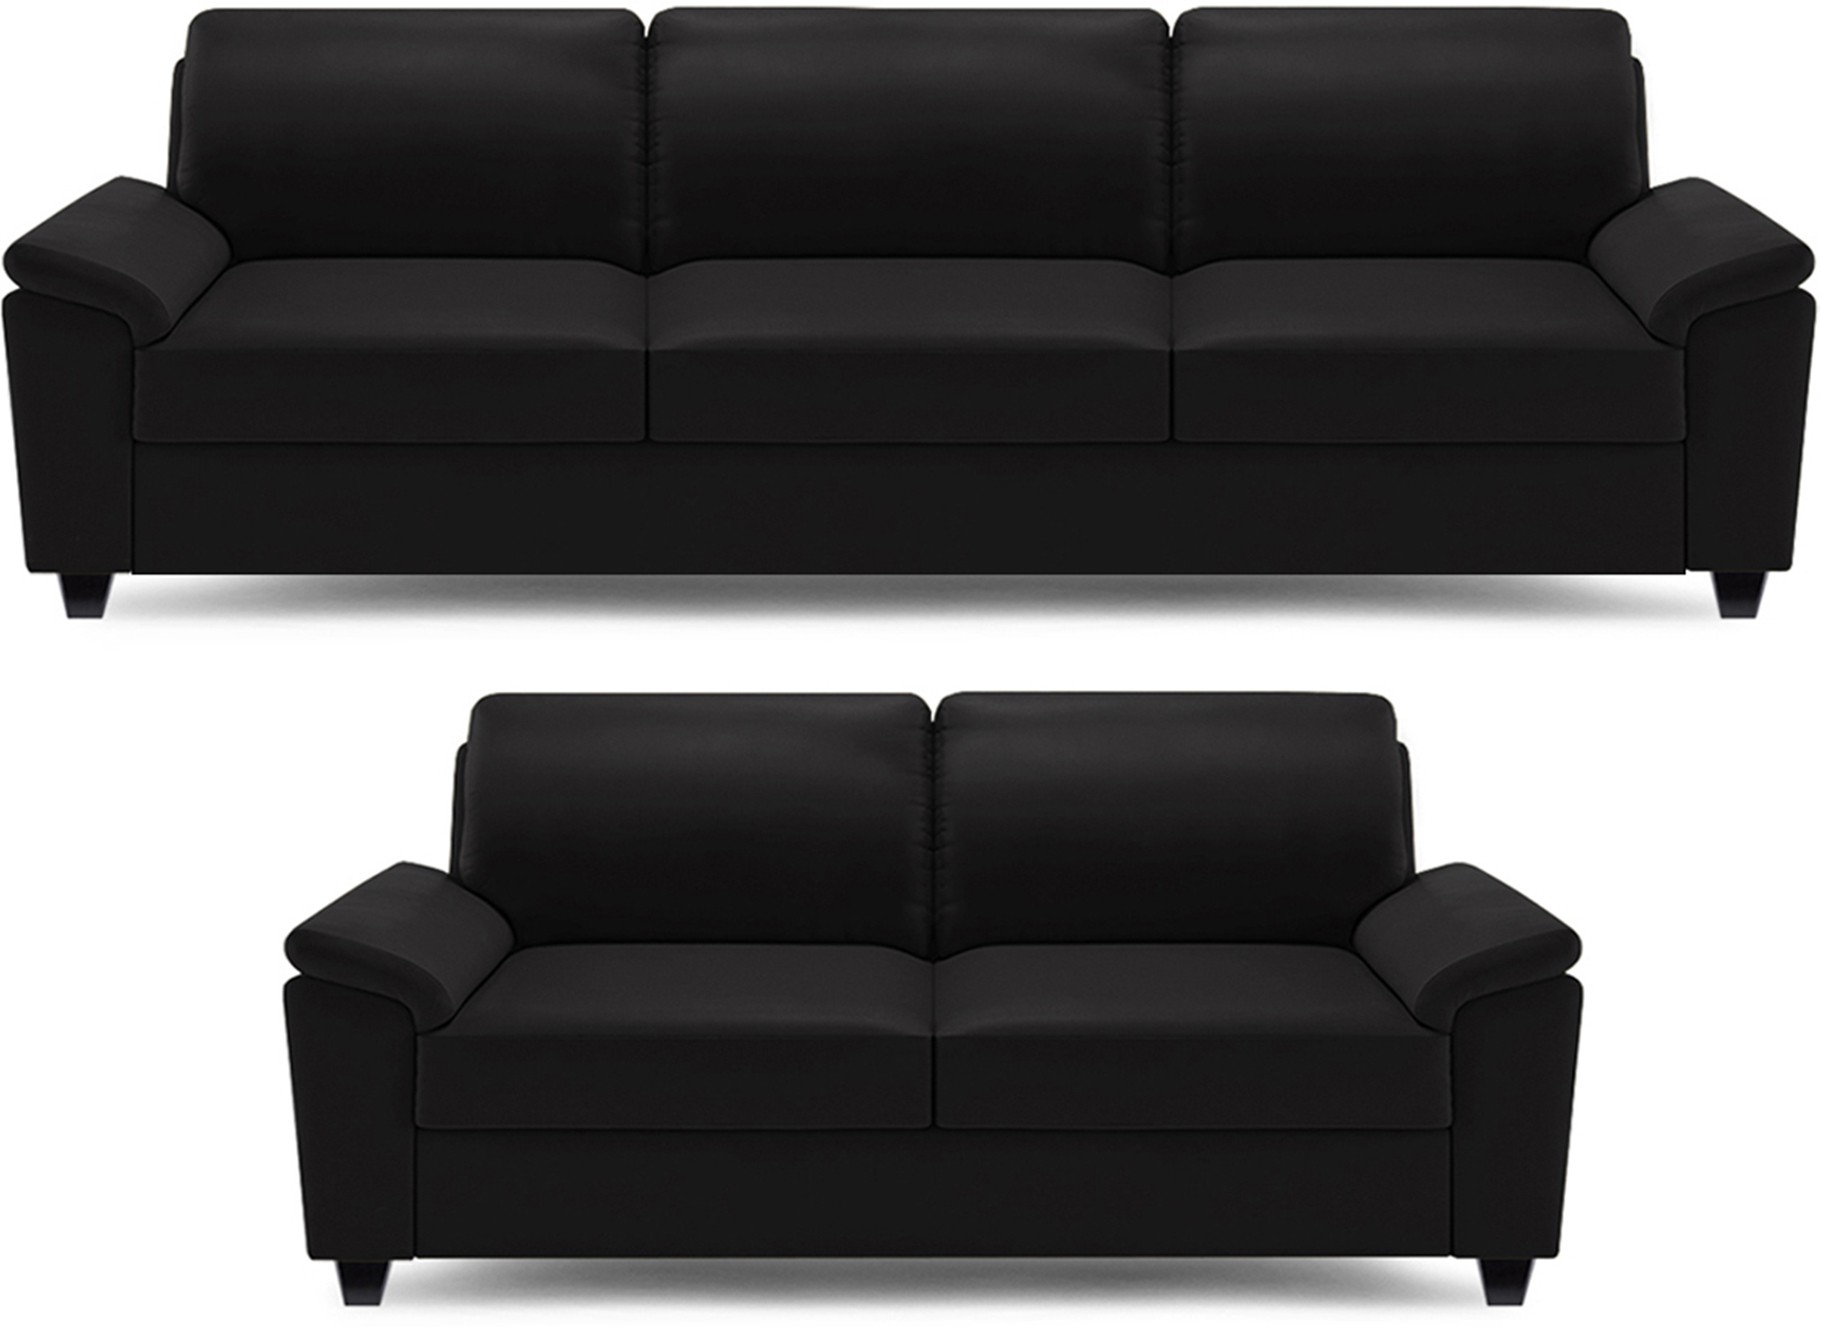 Peachy Dolphin Oxford Leatherette 3 2 Black Sofa Set Evergreenethics Interior Chair Design Evergreenethicsorg